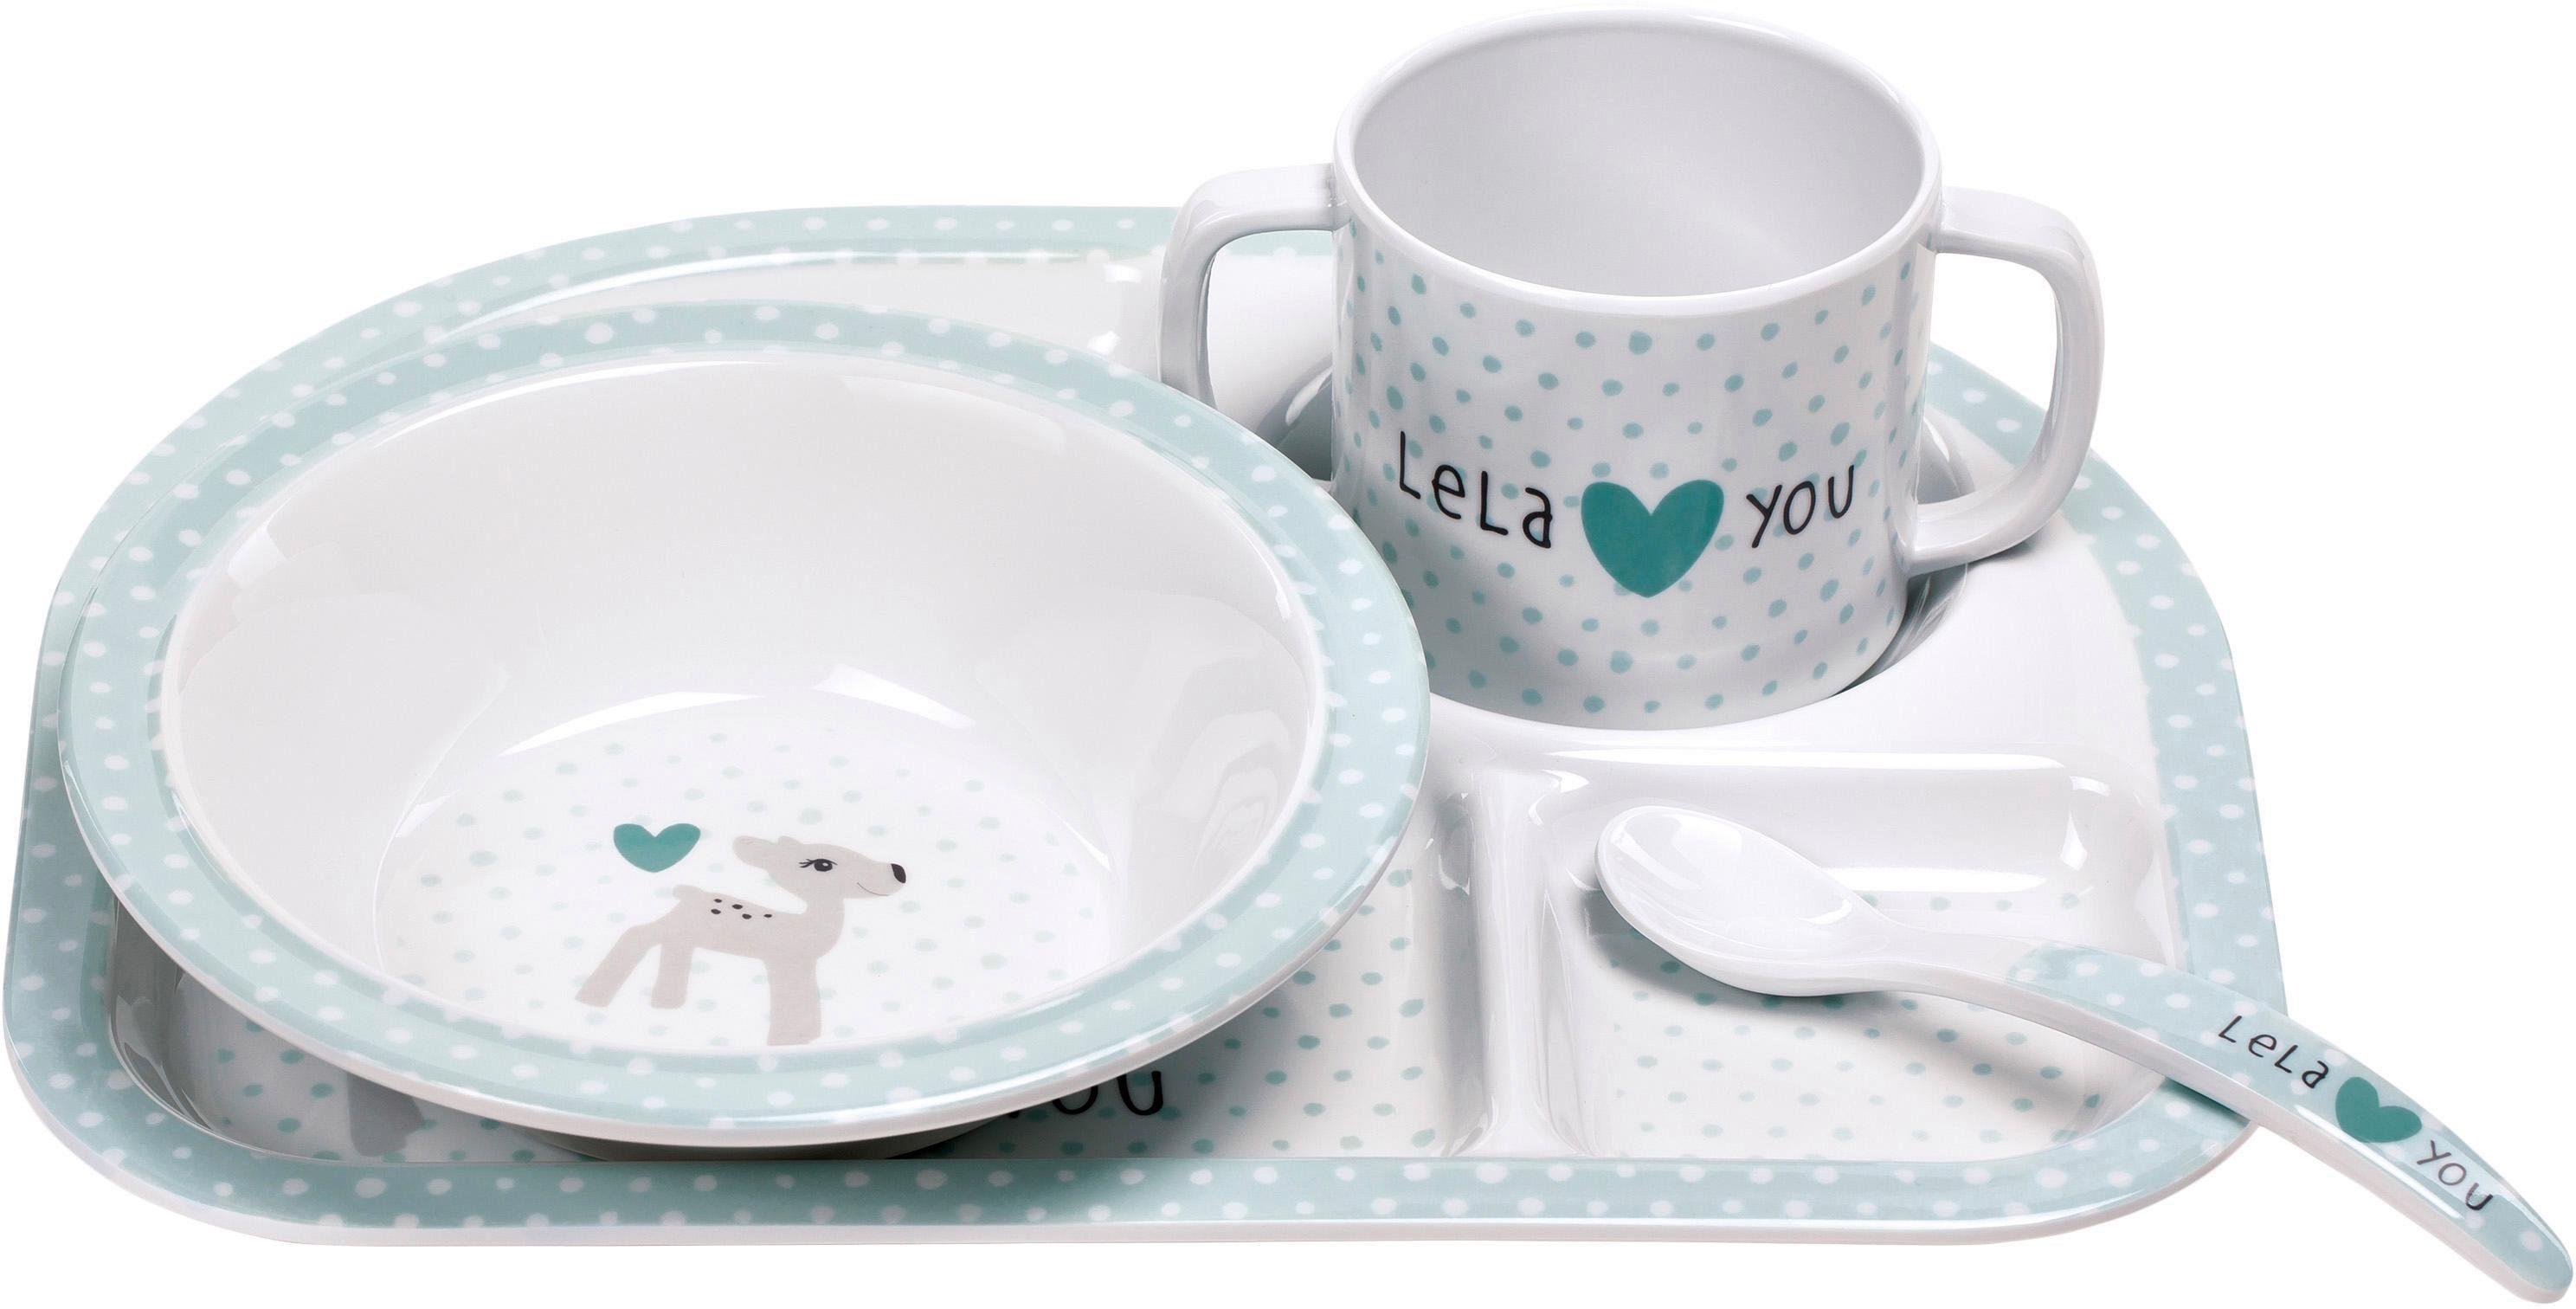 Lässig Kindergeschirr Set, 4-tlg., »Dish Set, Lela Light Mint«